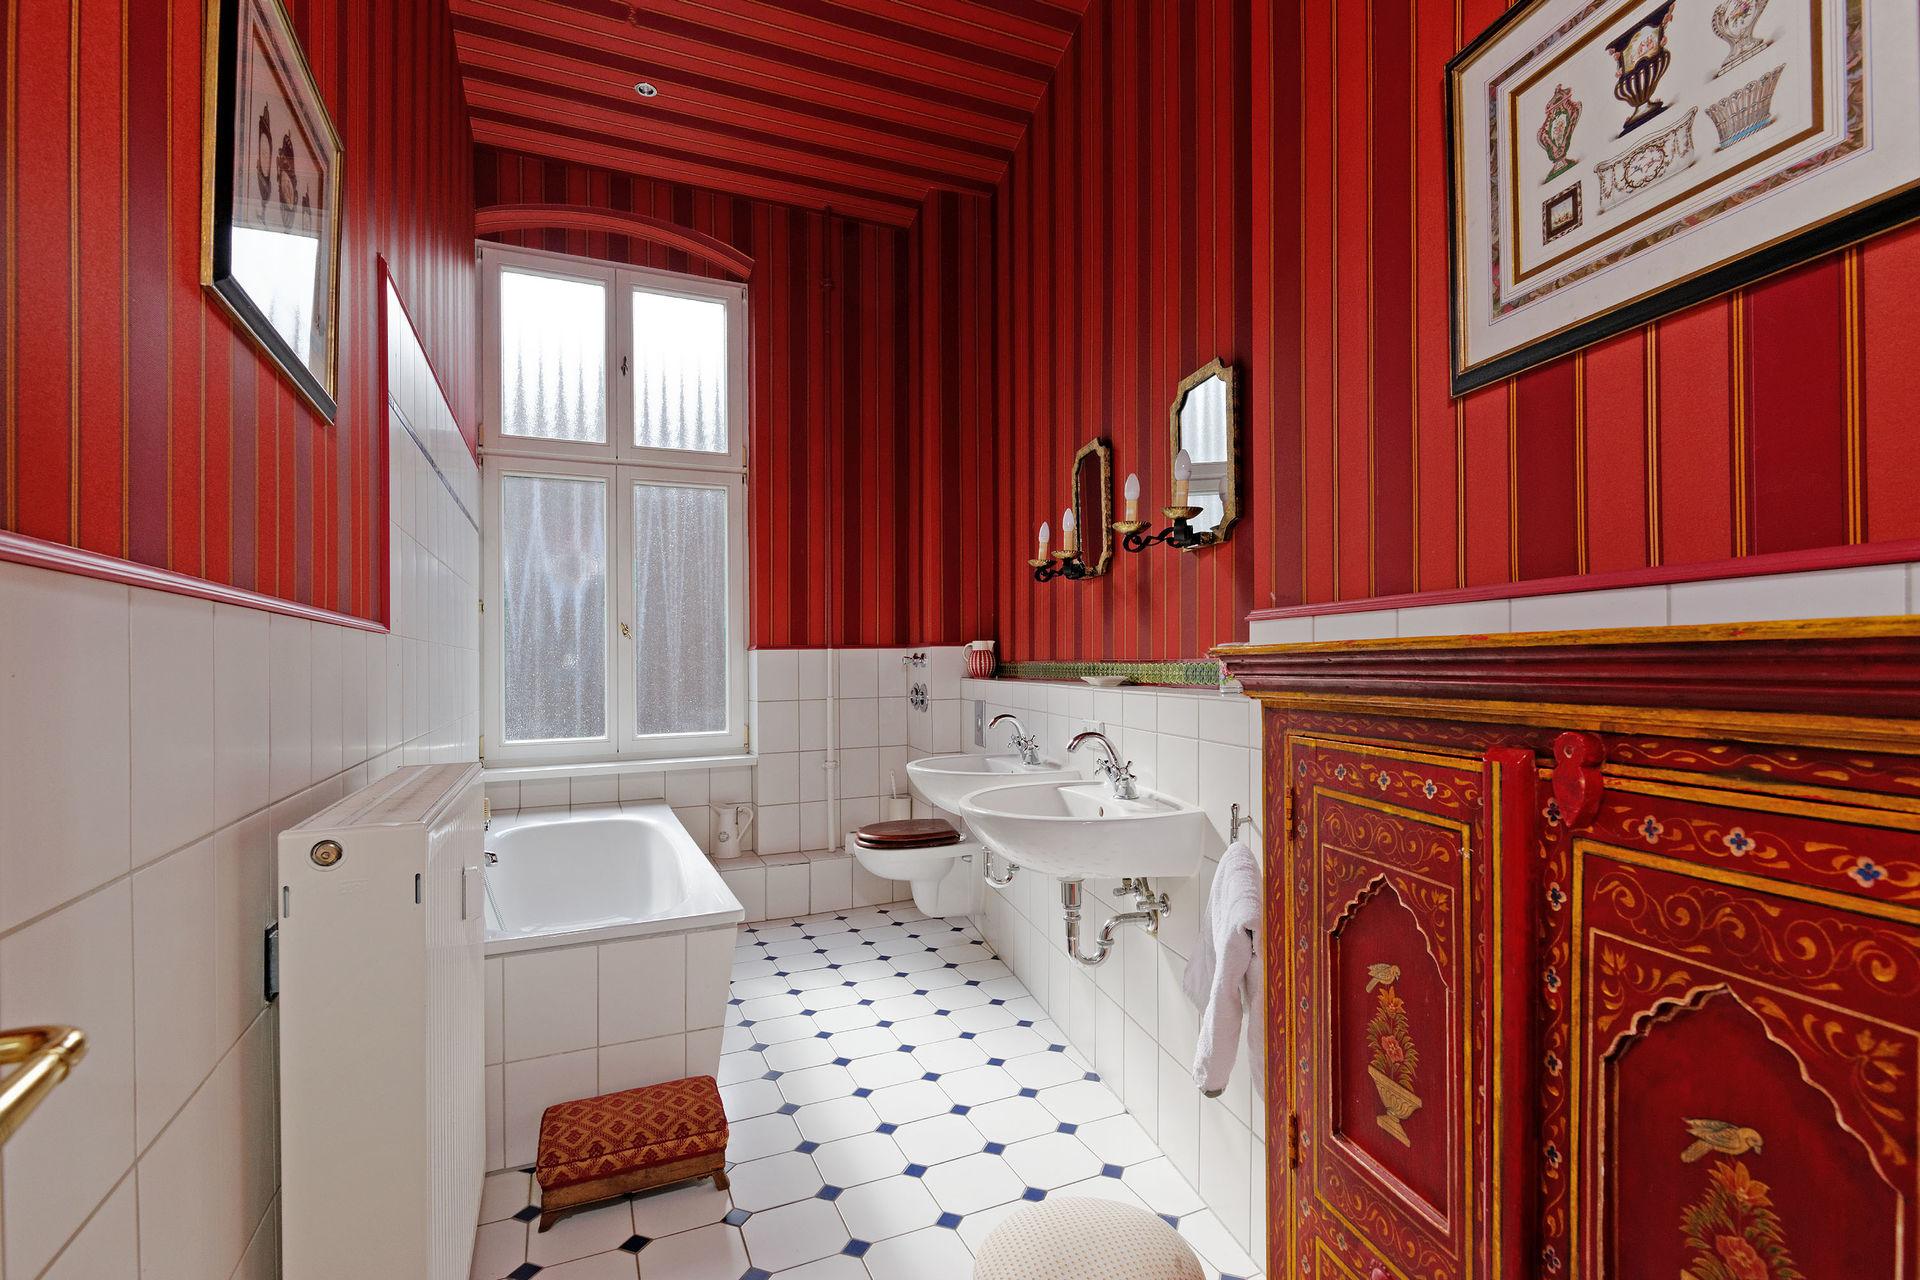 extravagant m blierte wohnung in berlin kreuzberg. Black Bedroom Furniture Sets. Home Design Ideas